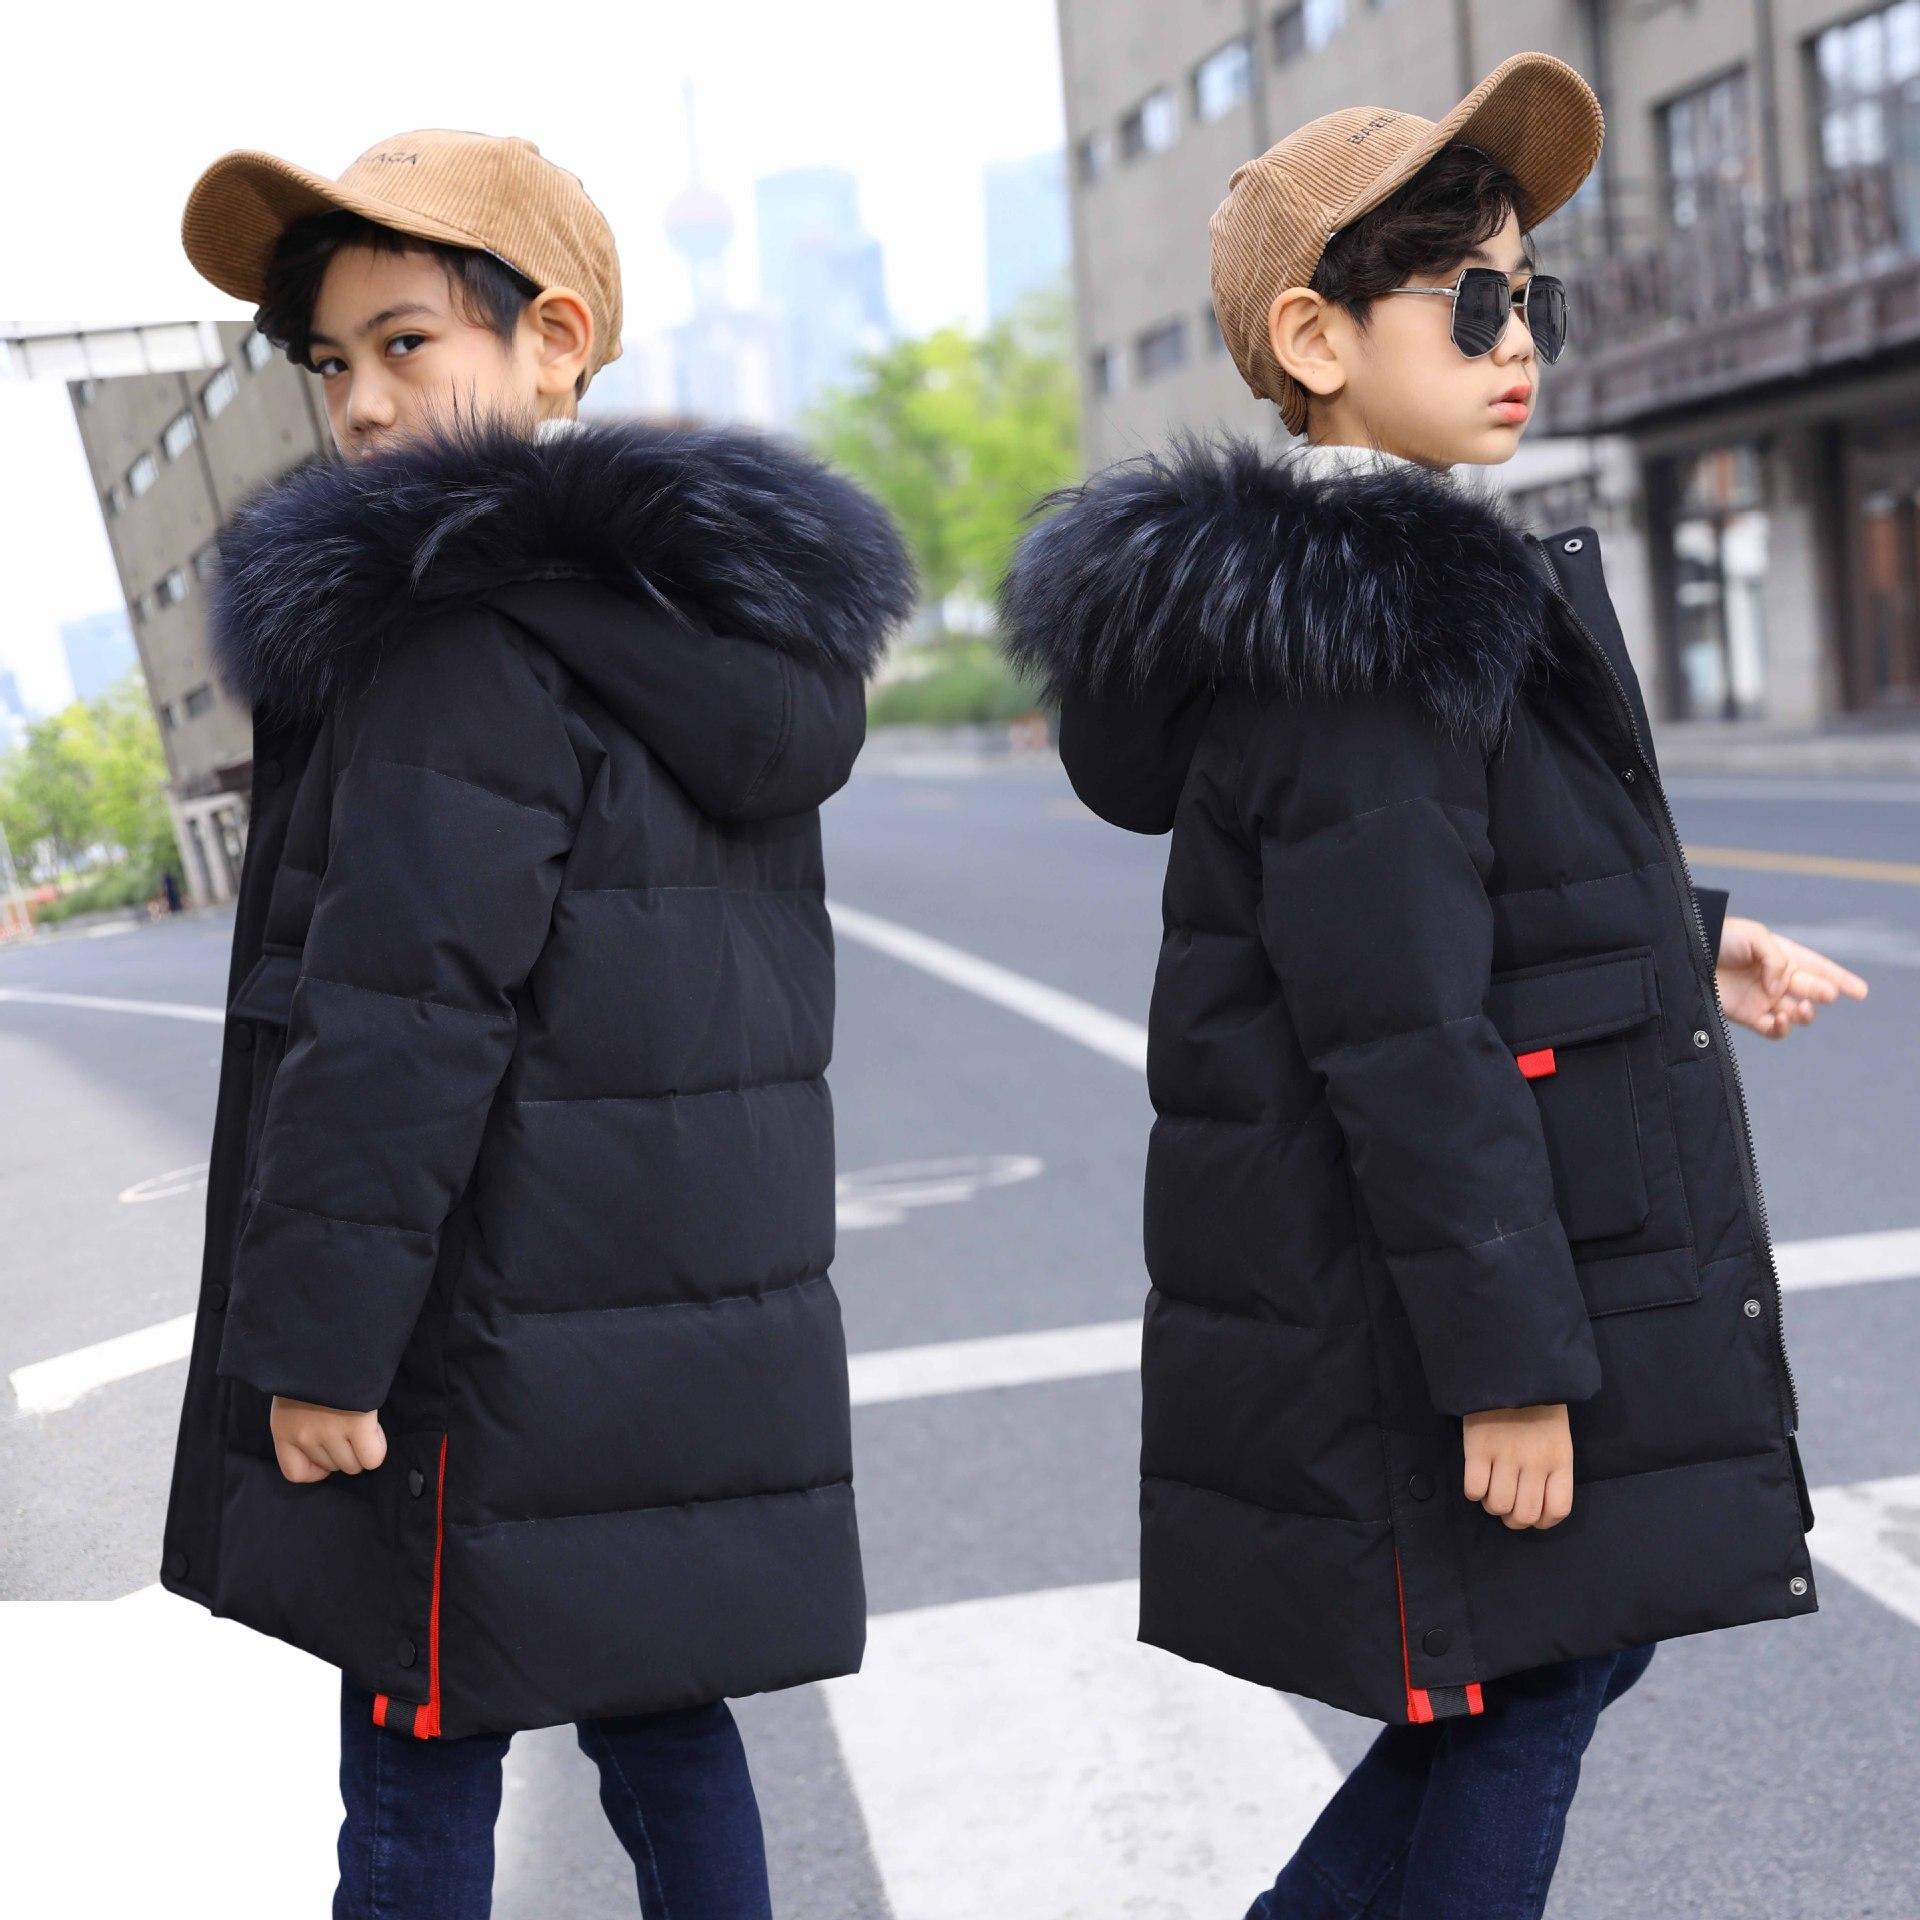 Coats Jackets Winter Outerwears Down Parkas Duck-Down Kids Children's Warm Thick Fur